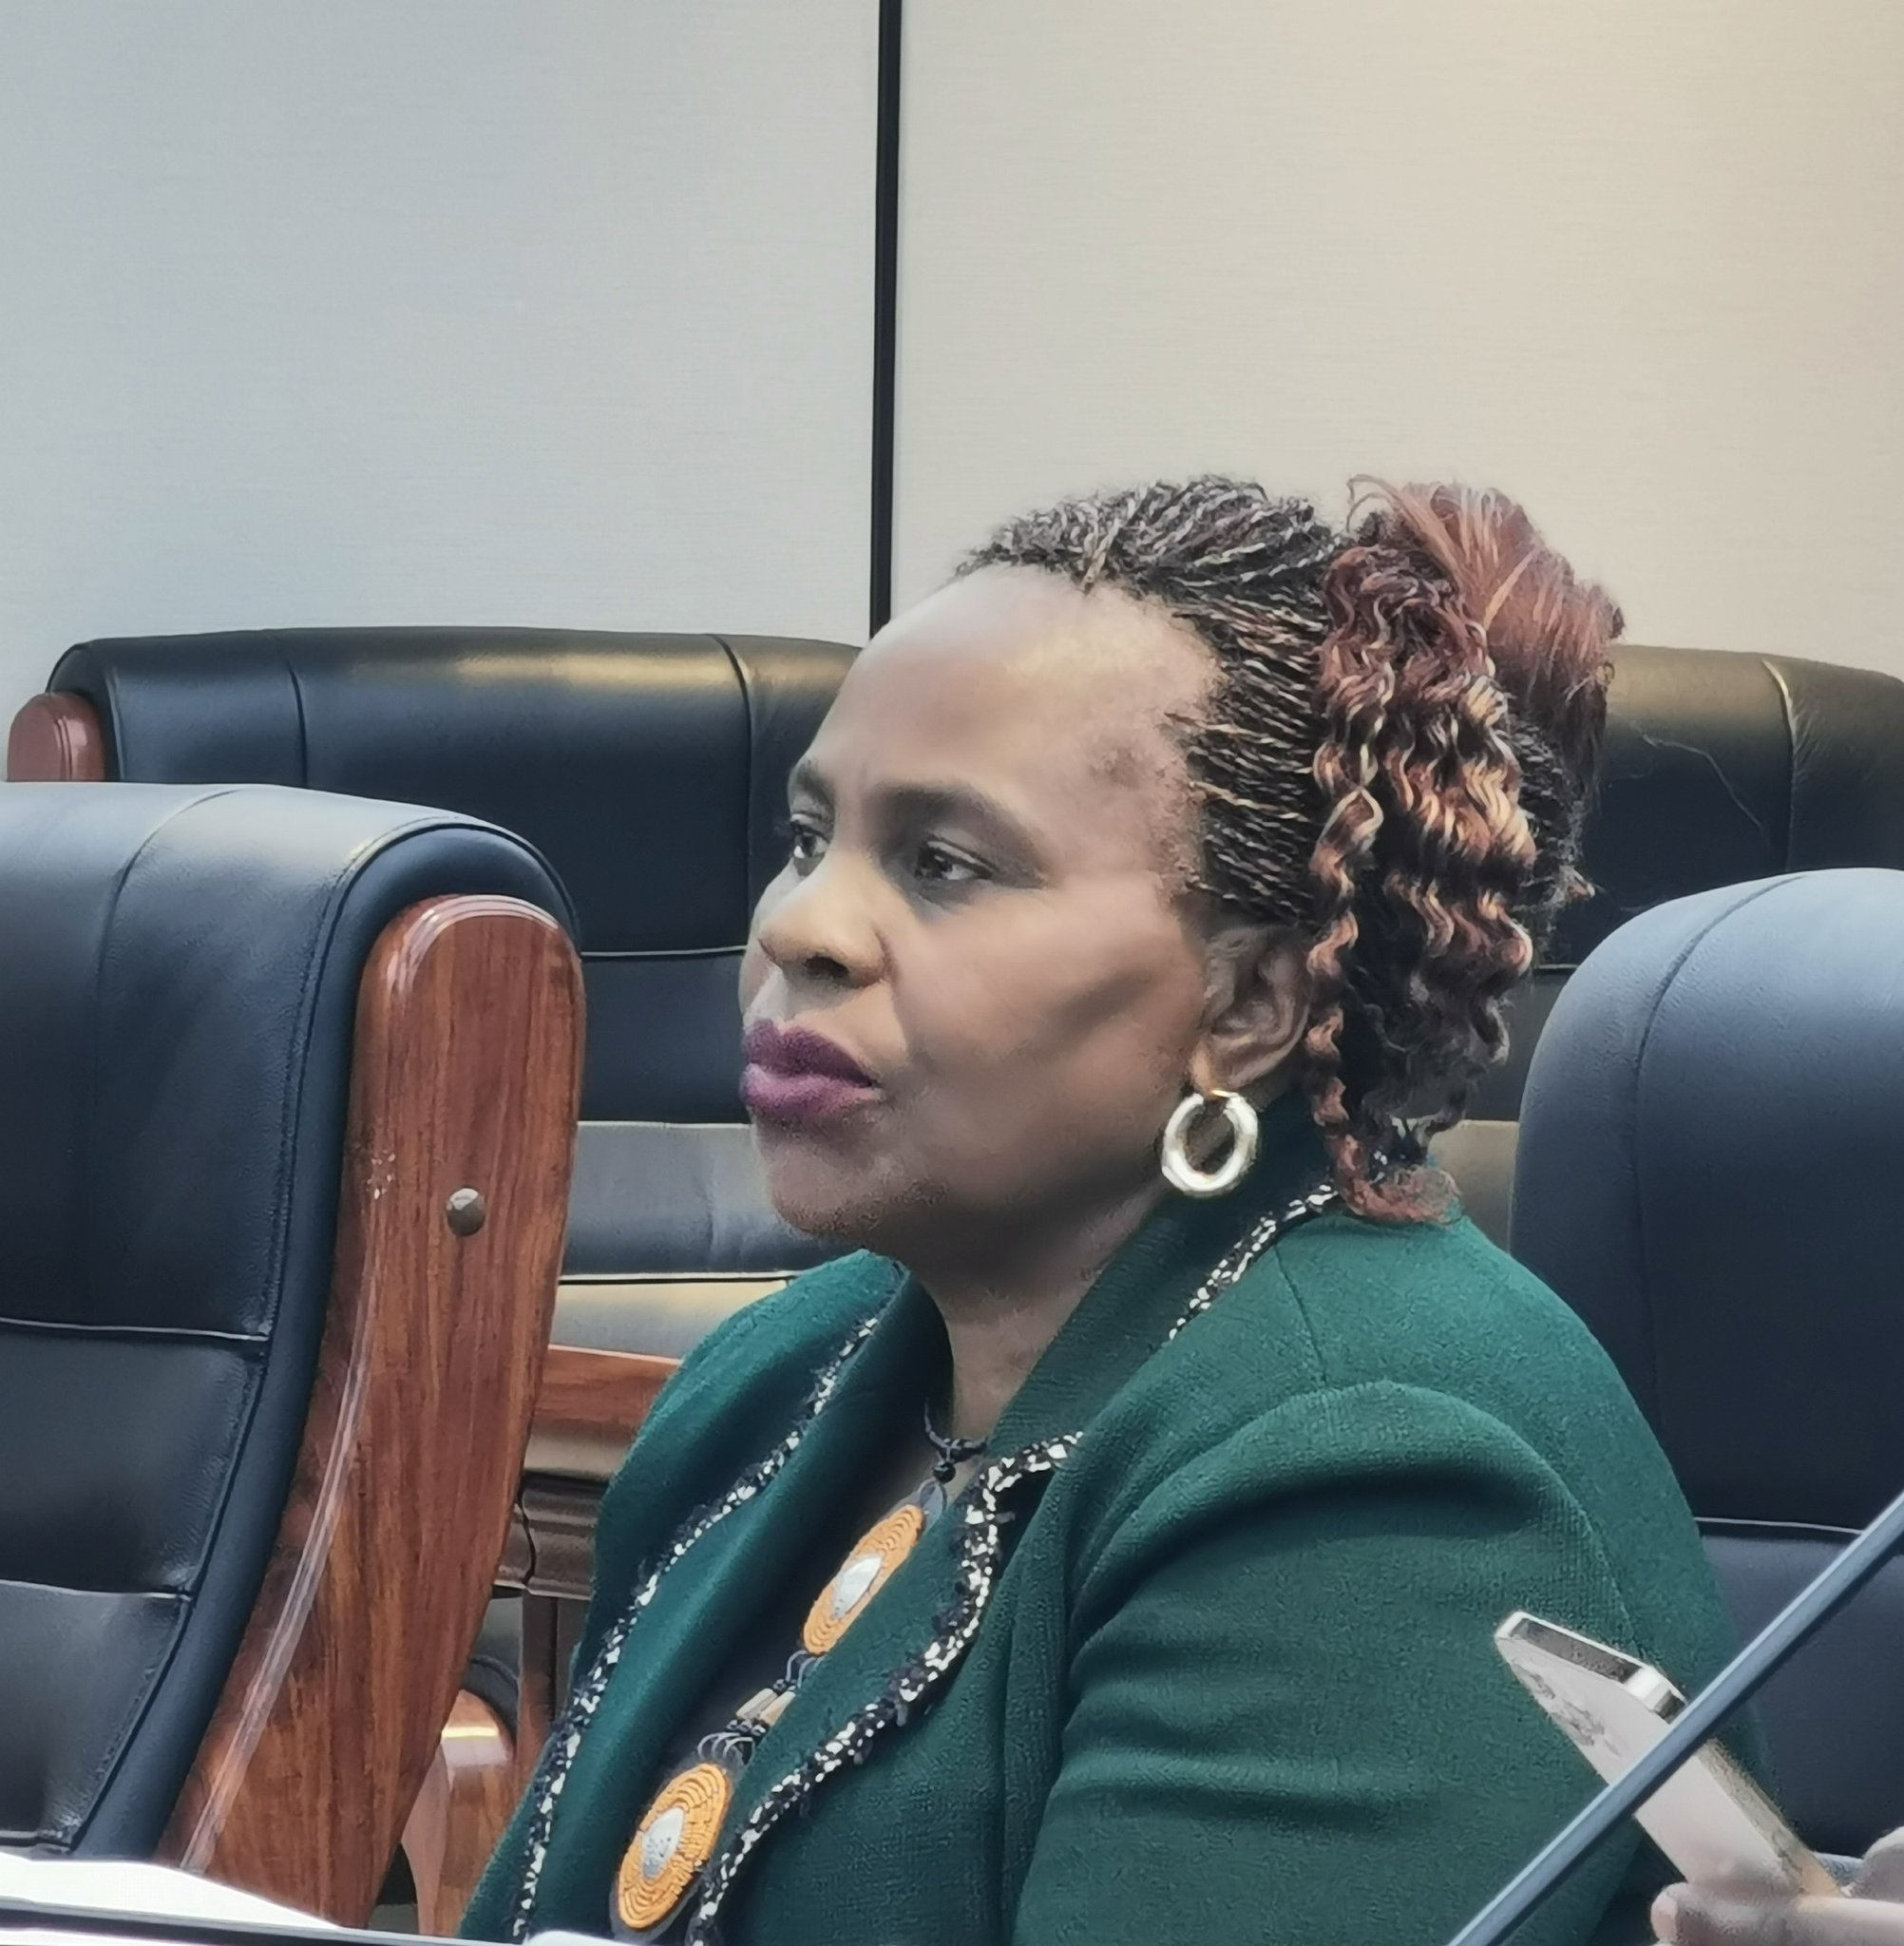 Schools to Remain Open Despite Mounting Covid-19 Cases in Schools - Zim Govt